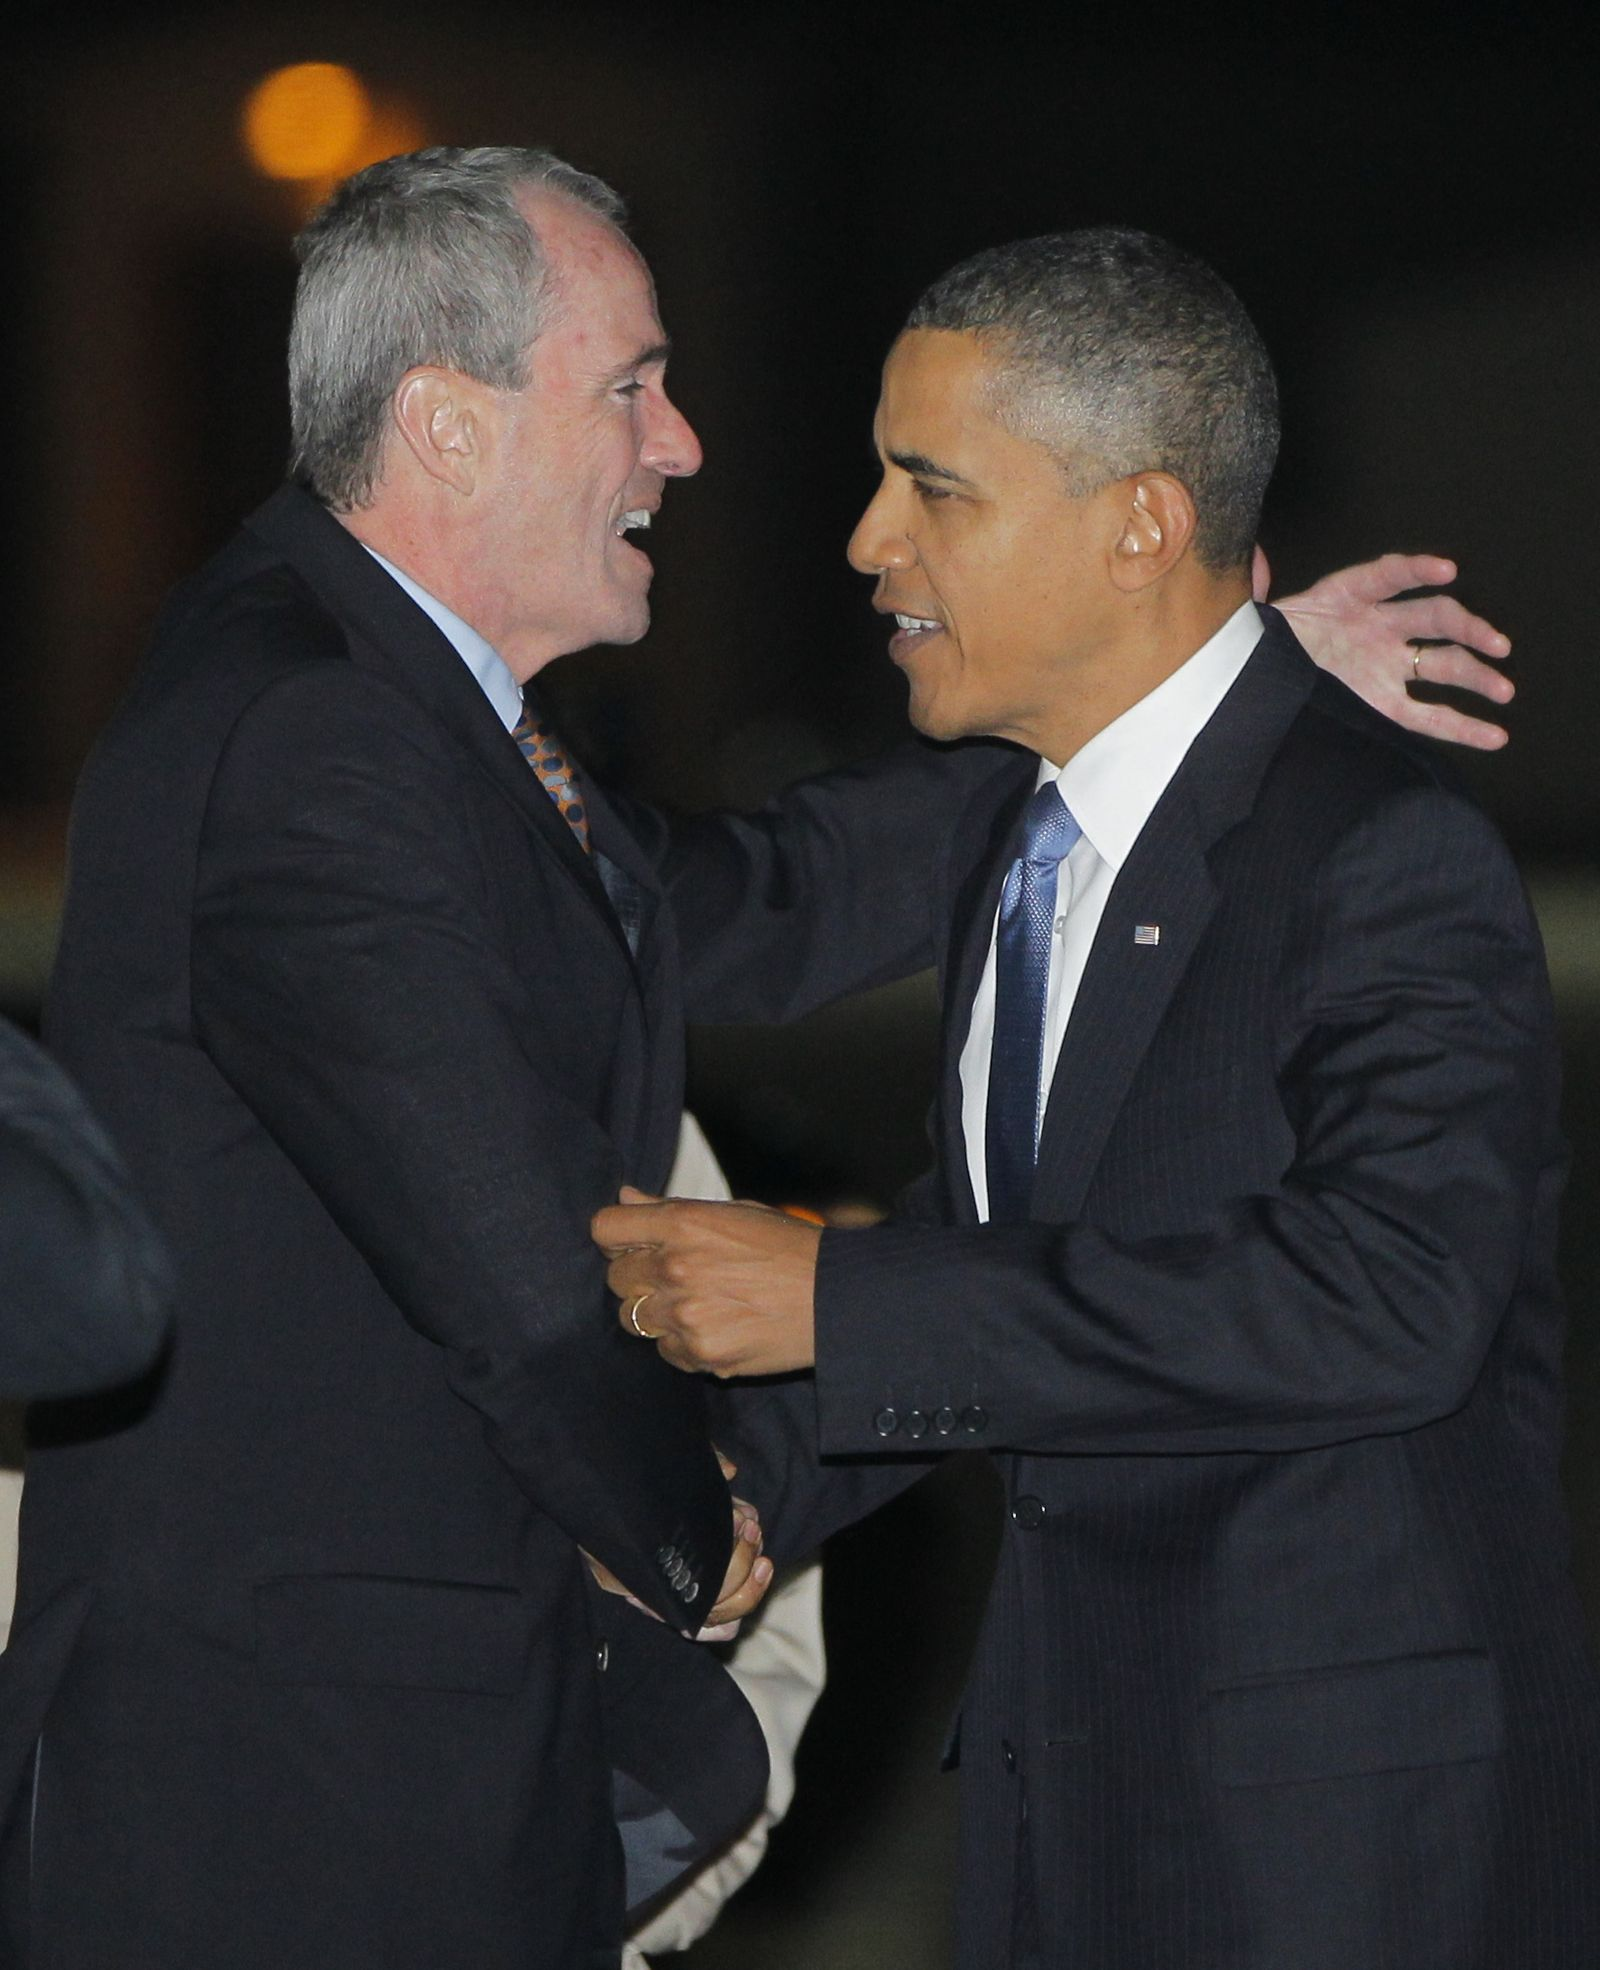 Philip D. Murphy/ Obama